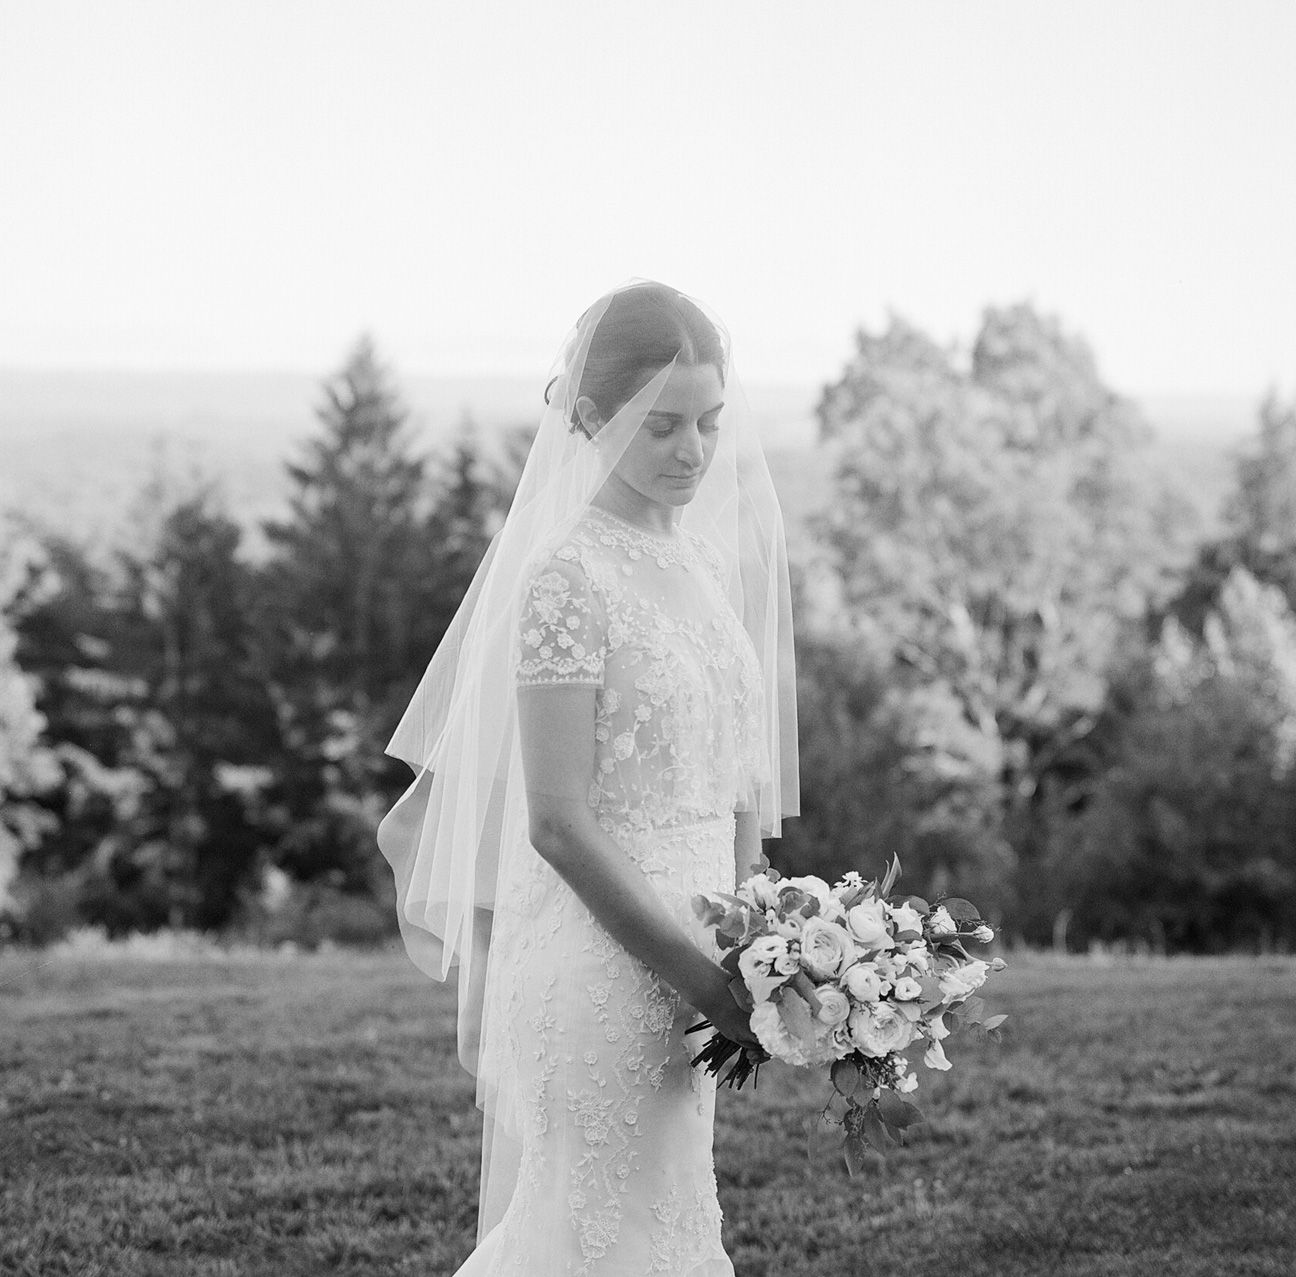 KarenHillPhotography-Parizat-Wedding-0498.jpg